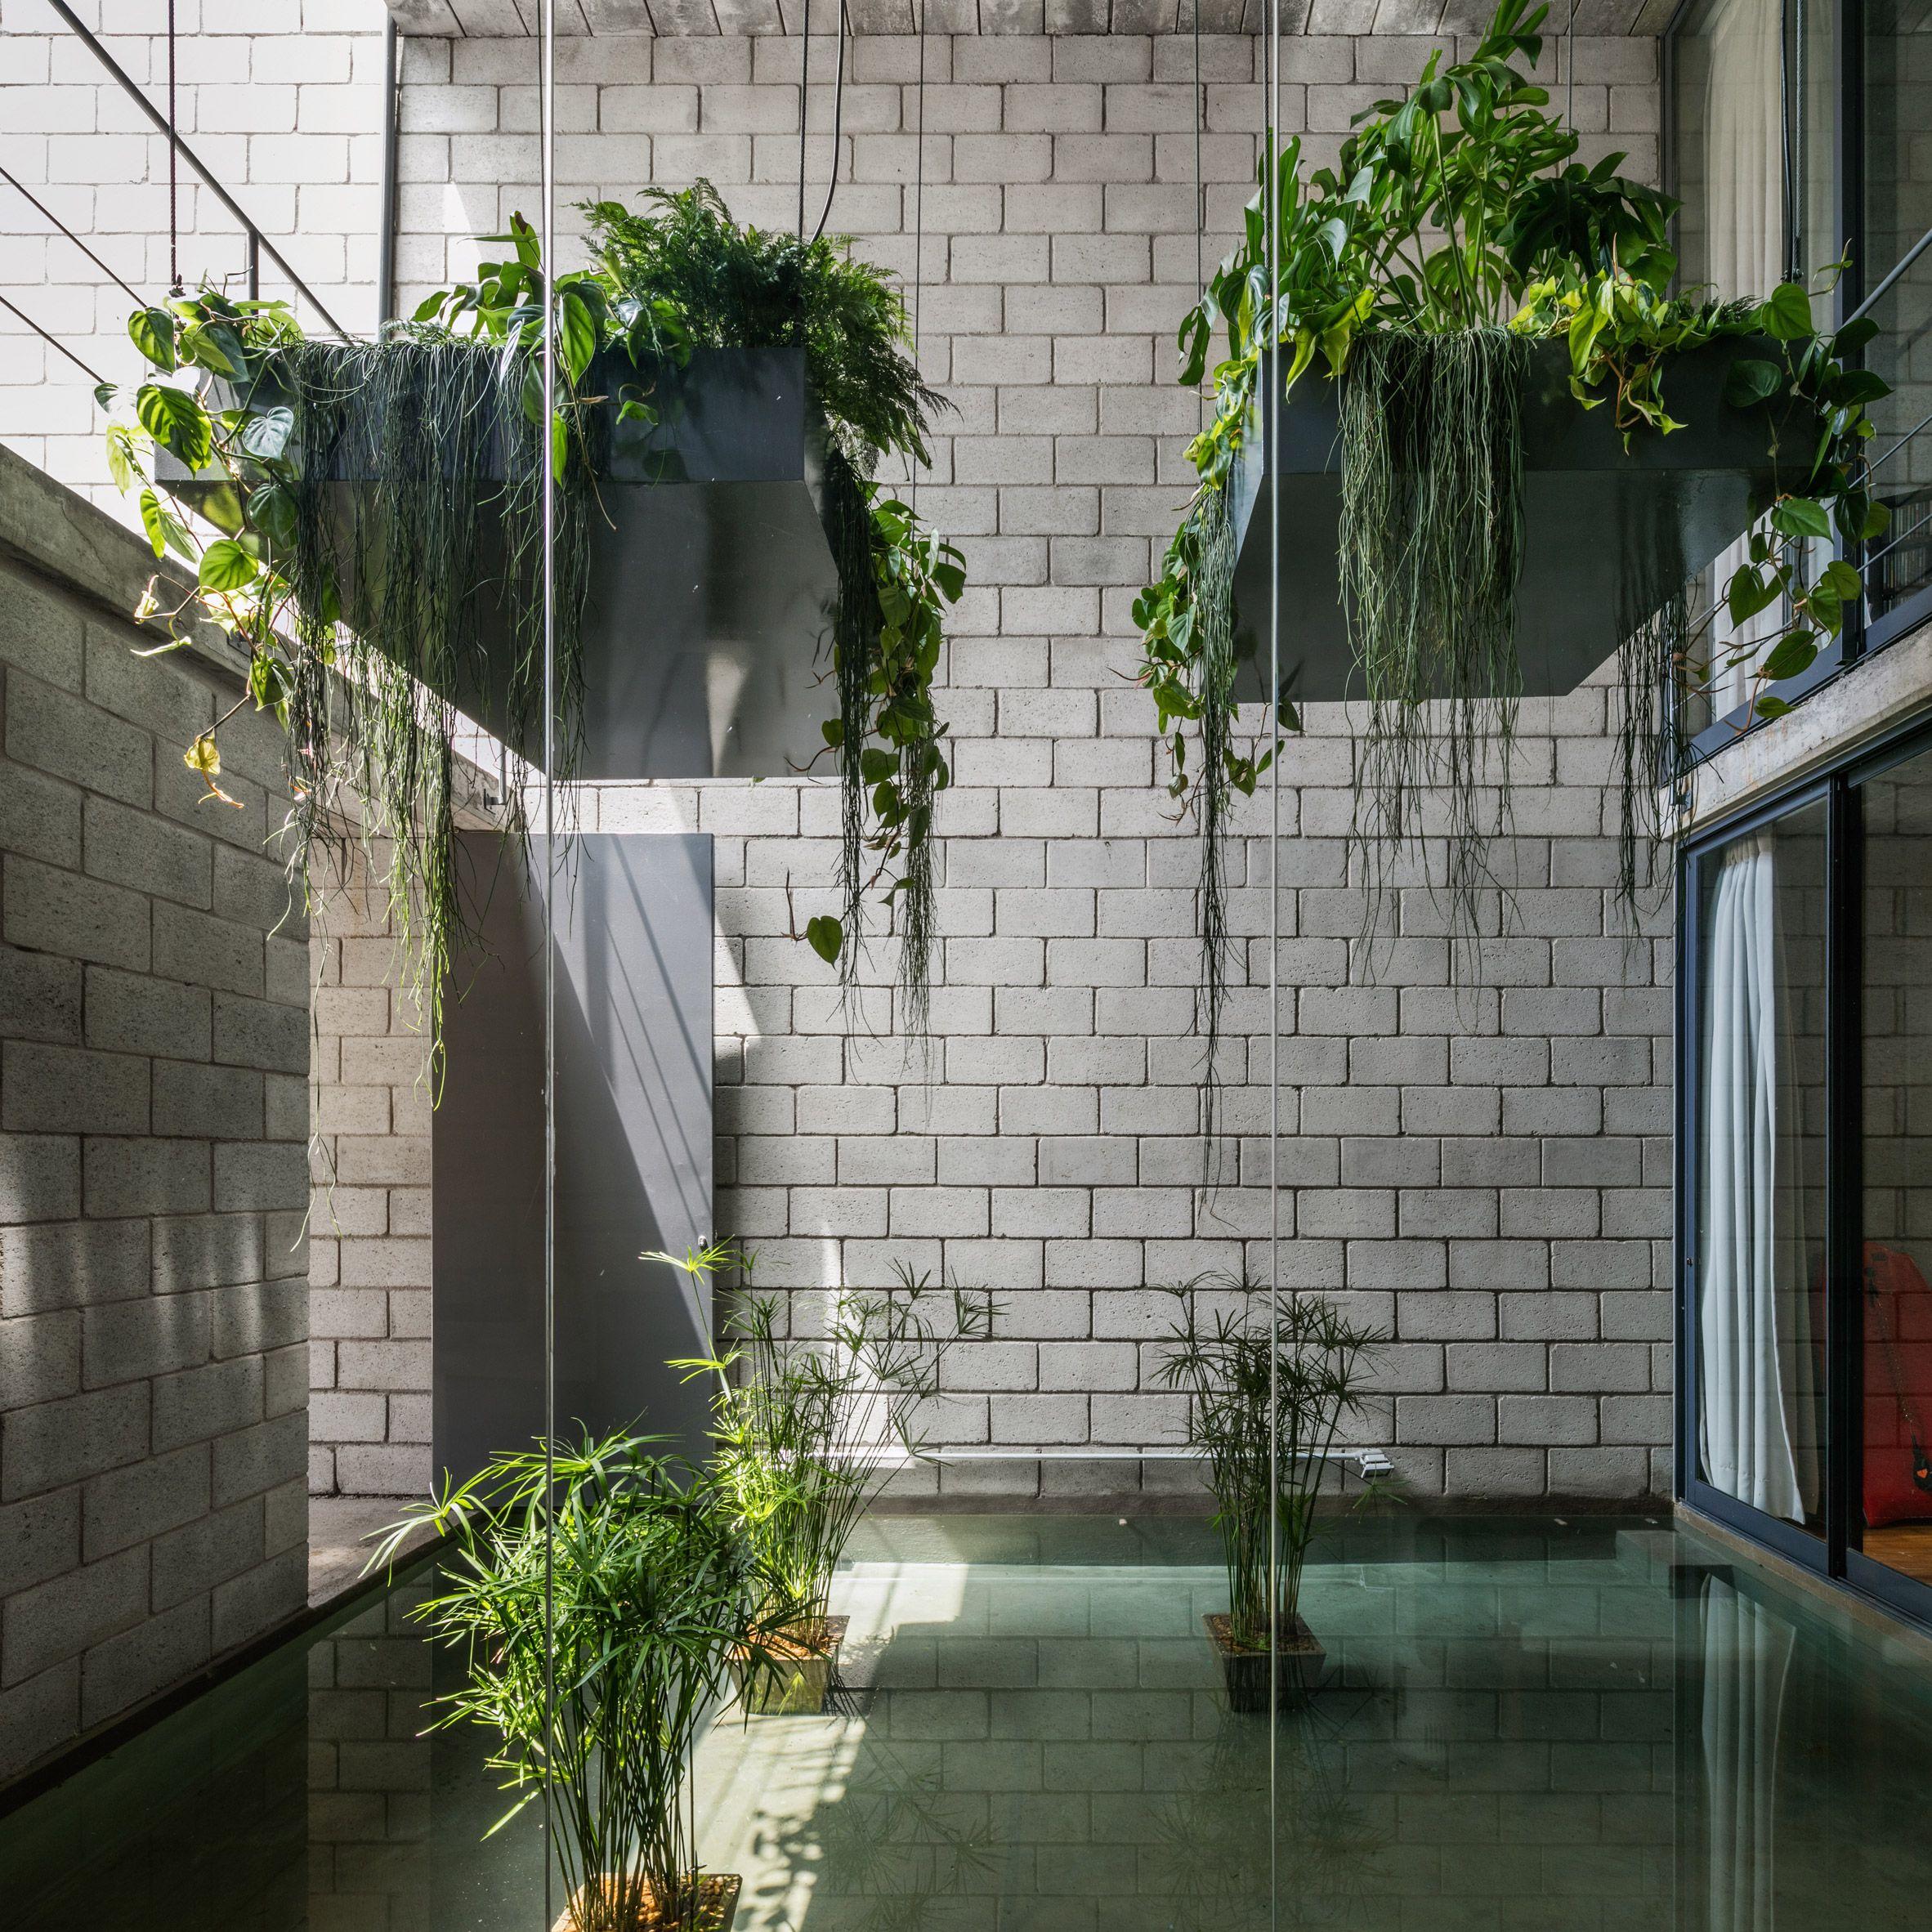 Brazilian Studio Terra E Tuma Has Designed A Slender Urban Home With Concrete Block Walls And Rooms Organise Concrete House Architecture Apartment Architecture